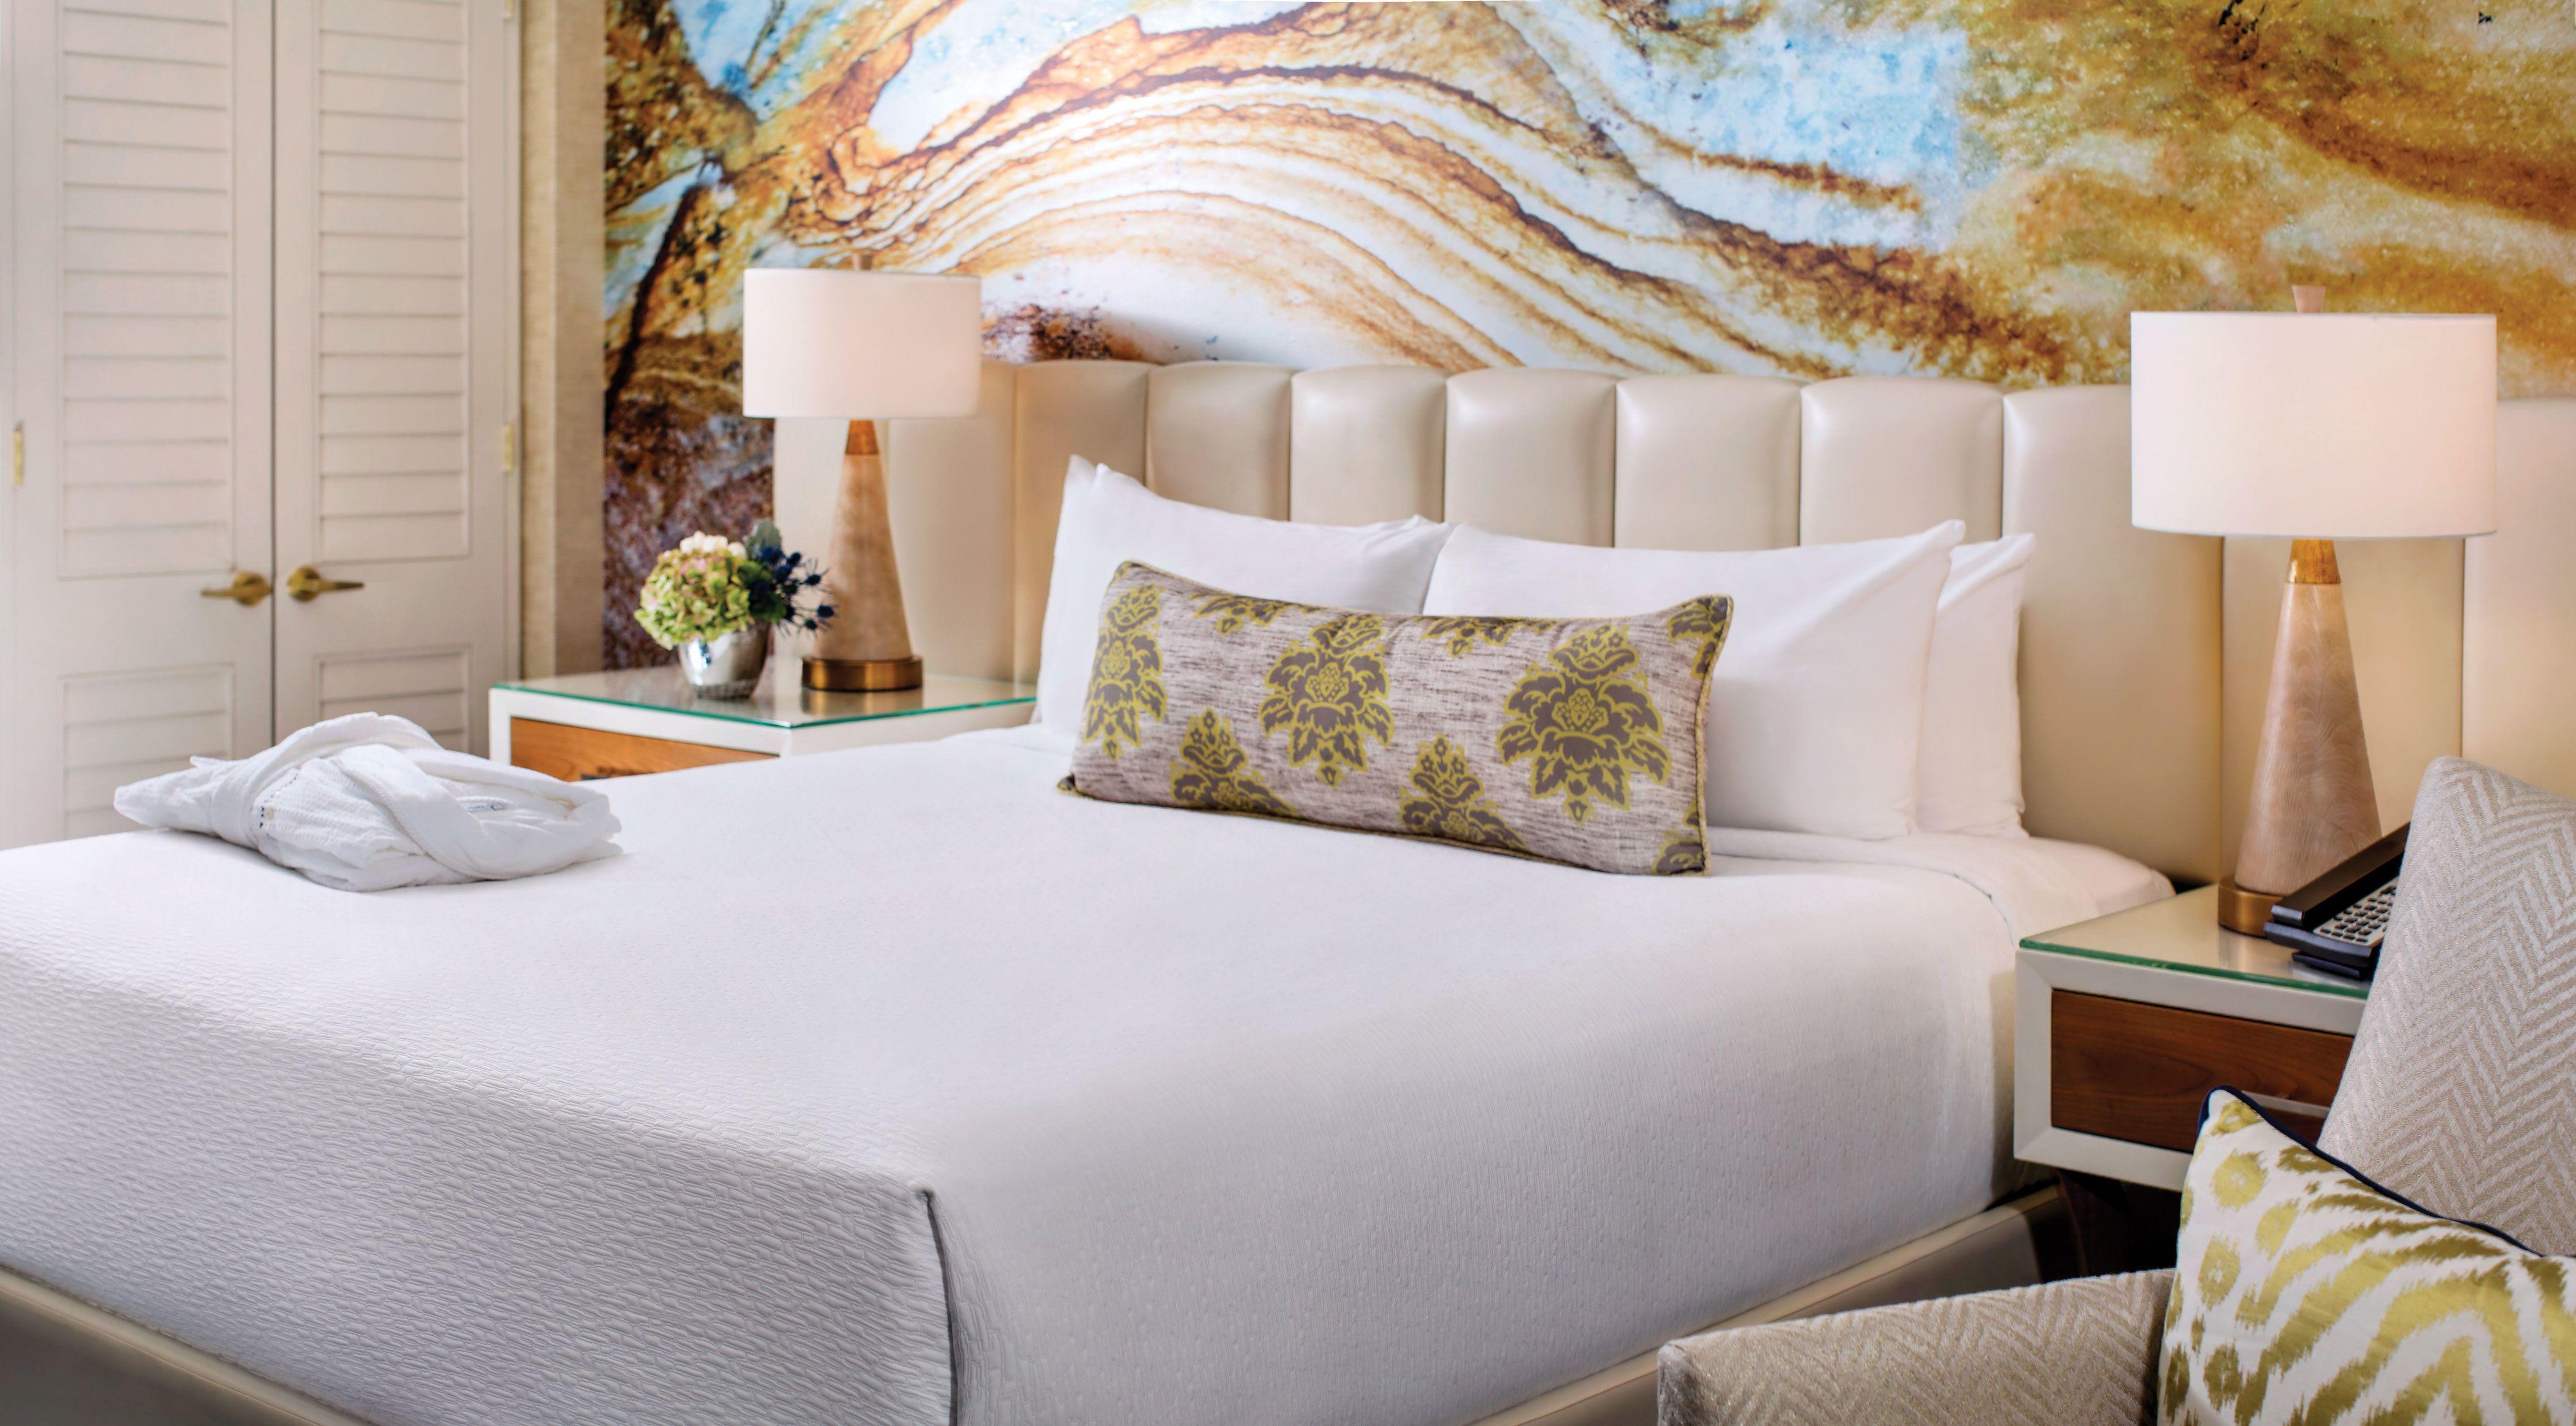 The revamped Resort rooms inside MandalayBay feels like a